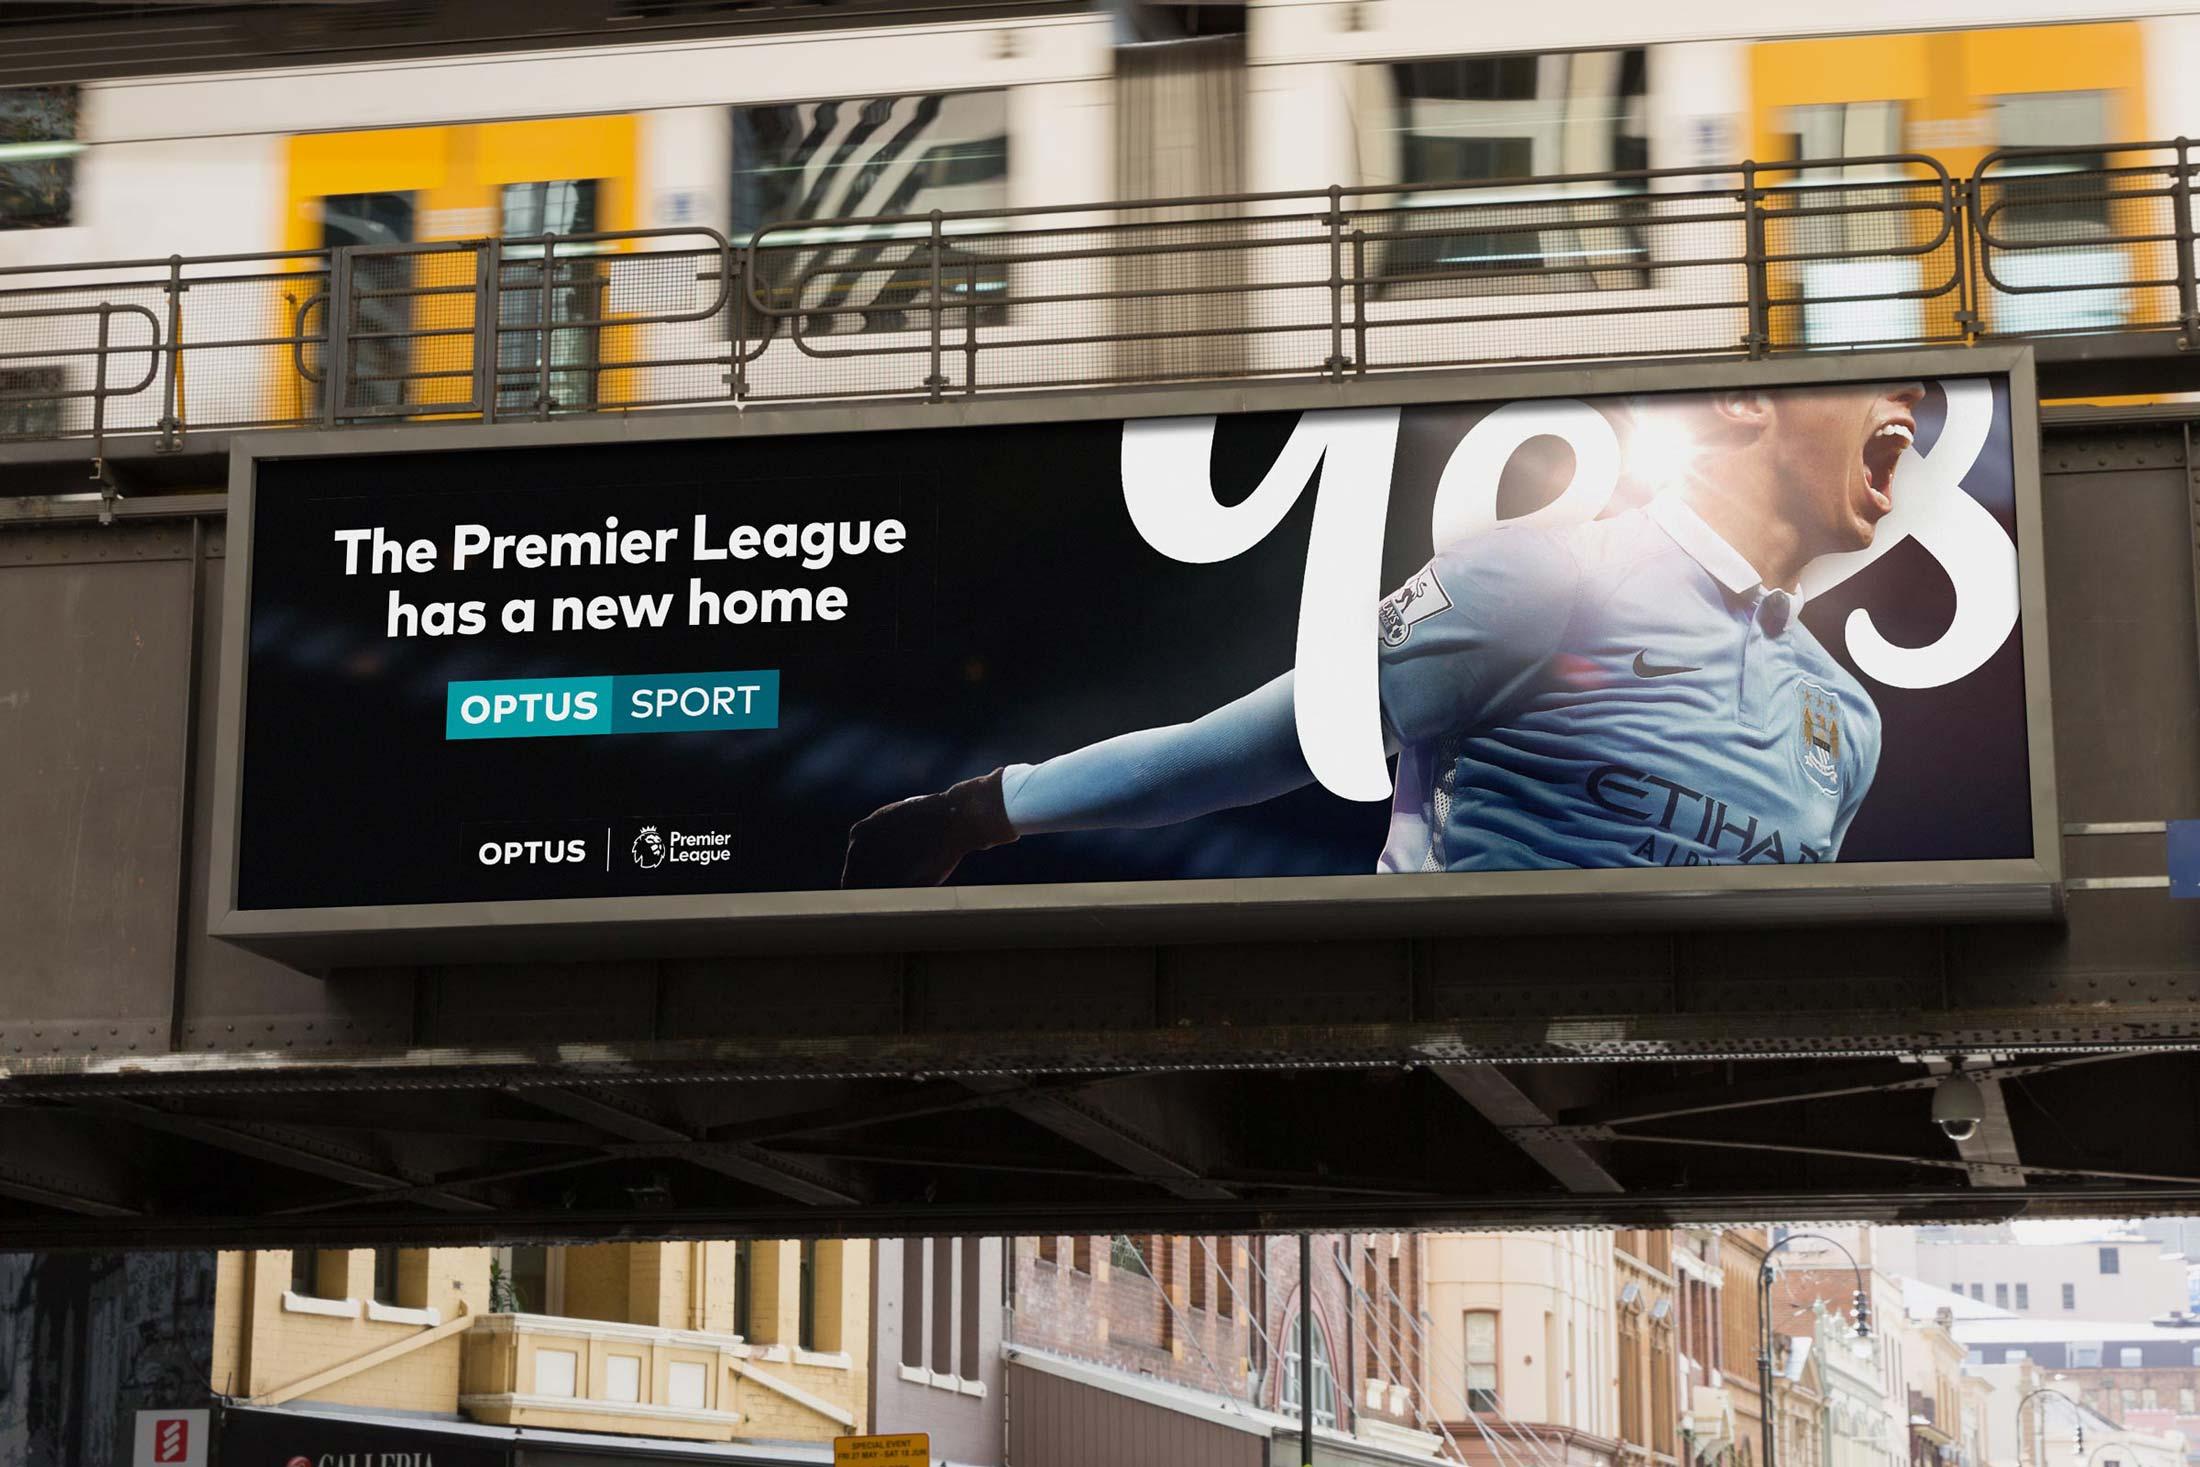 Optus-Identity-Premier-League-Billboard.jpg